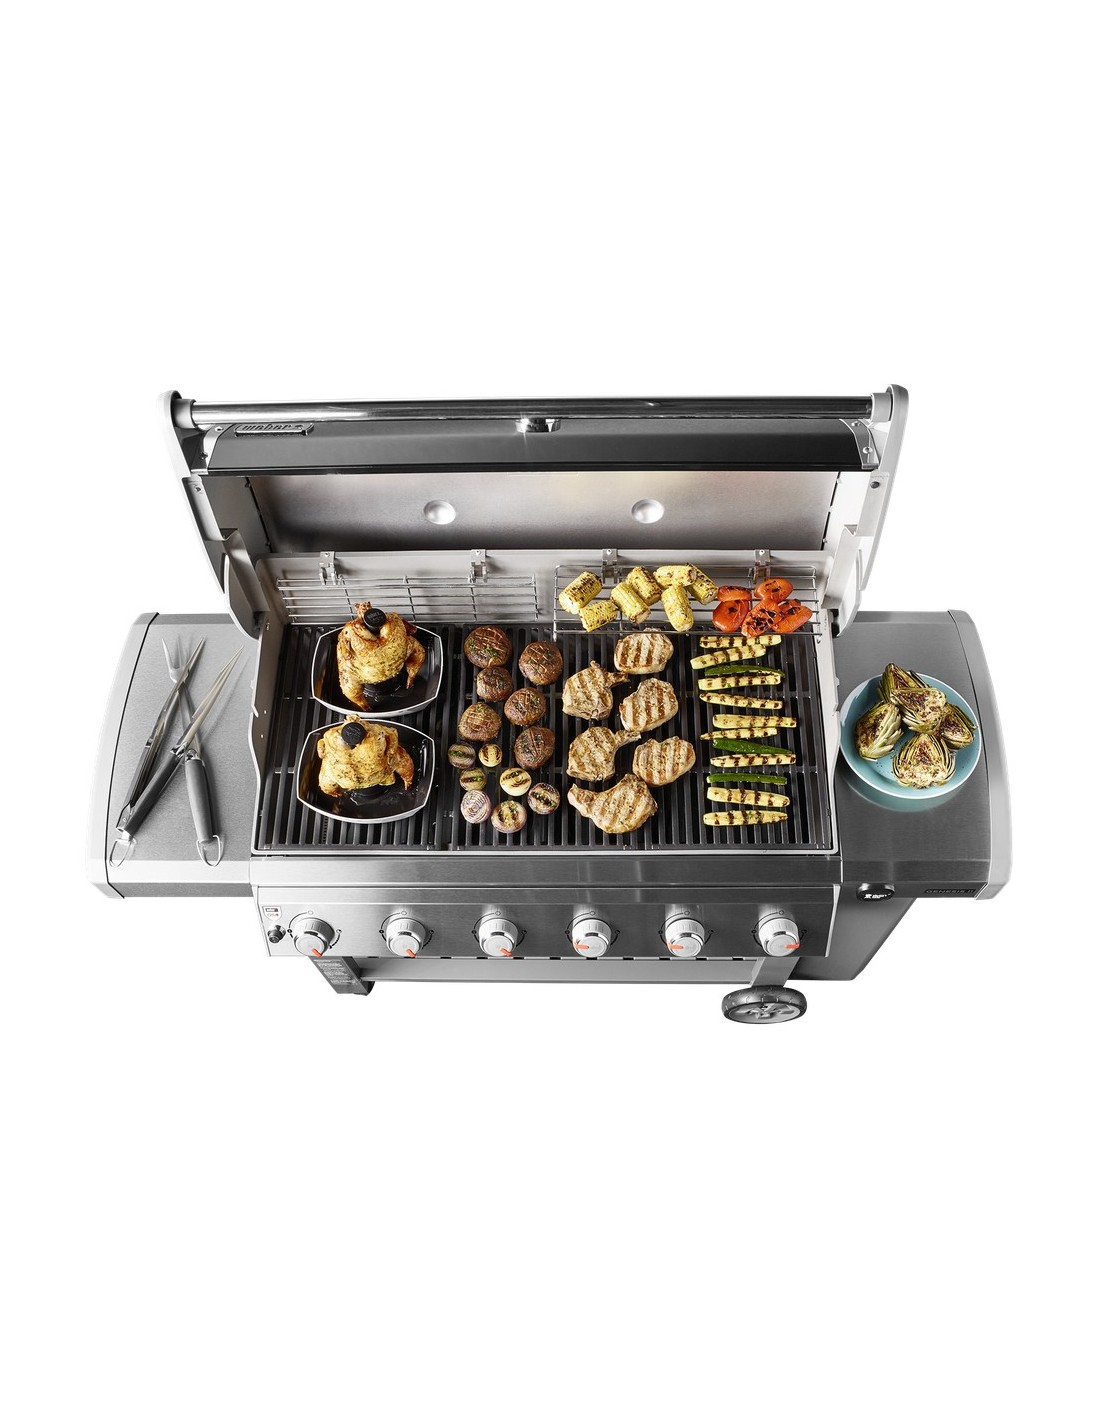 barbecue gaz genesis ii lx s 640 gbs inox plancha offerte weber. Black Bedroom Furniture Sets. Home Design Ideas